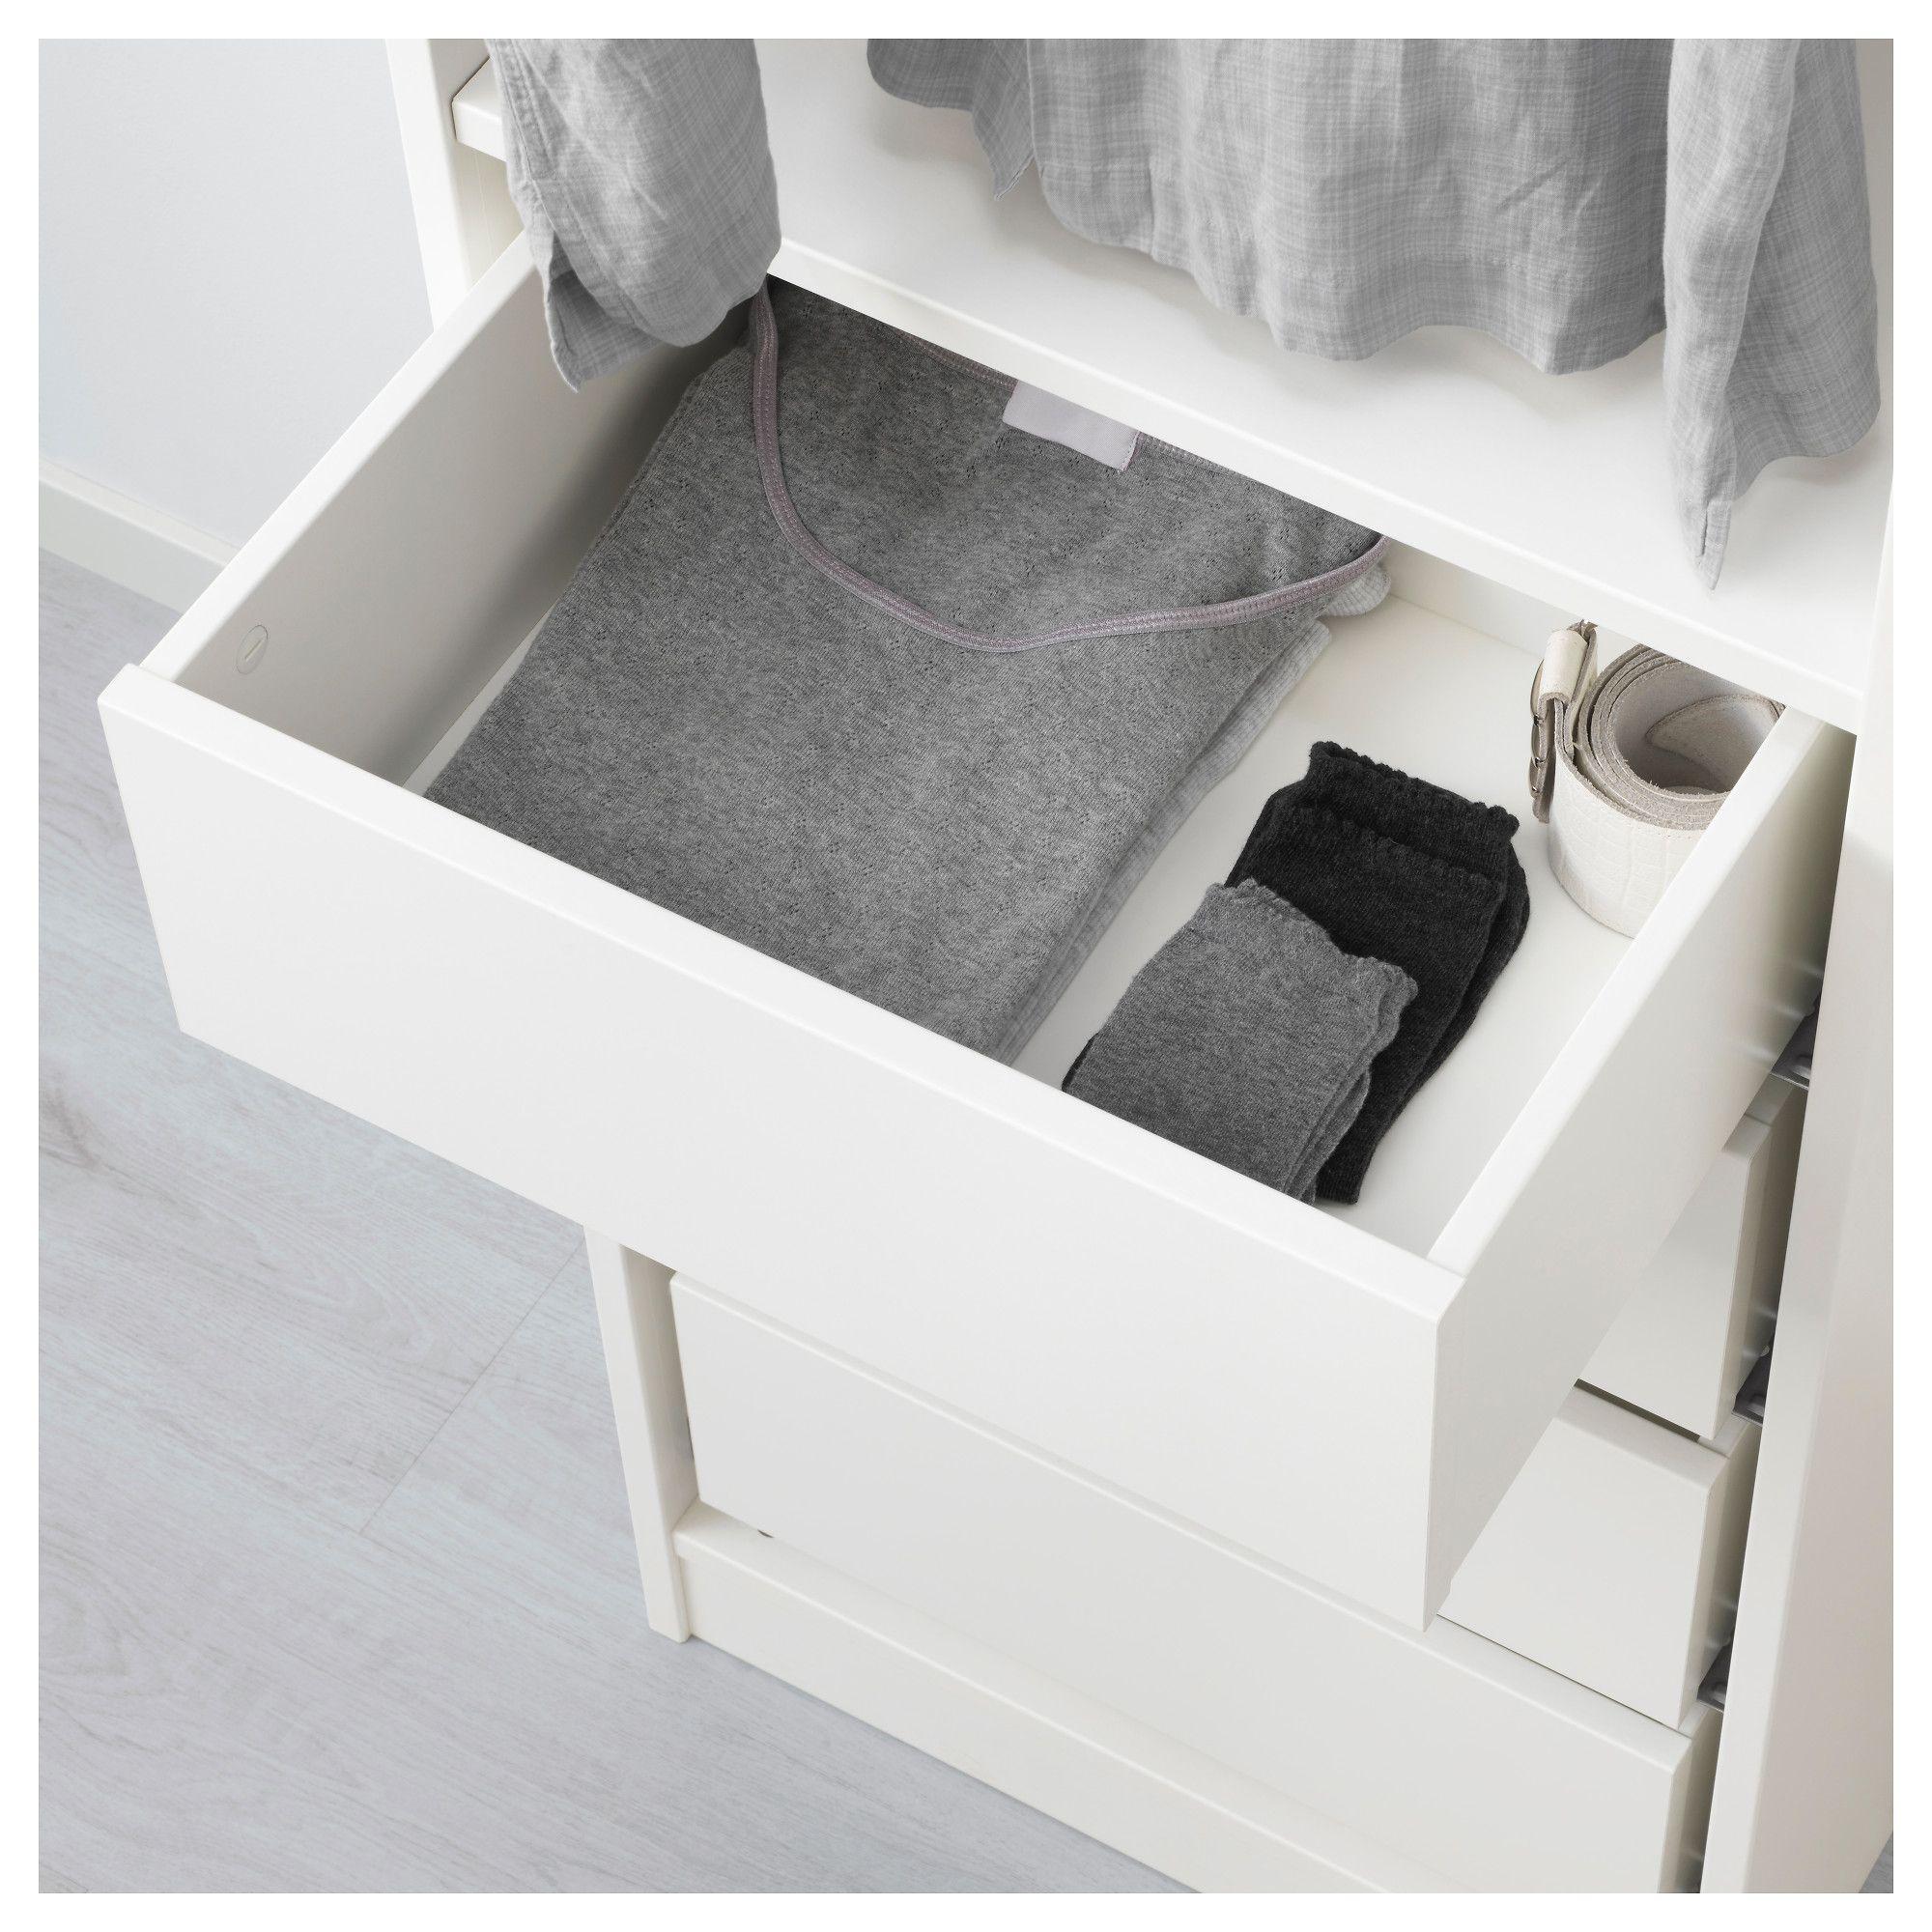 Komplement Schublade Weiss In 2019 Products Schubladen Ikea